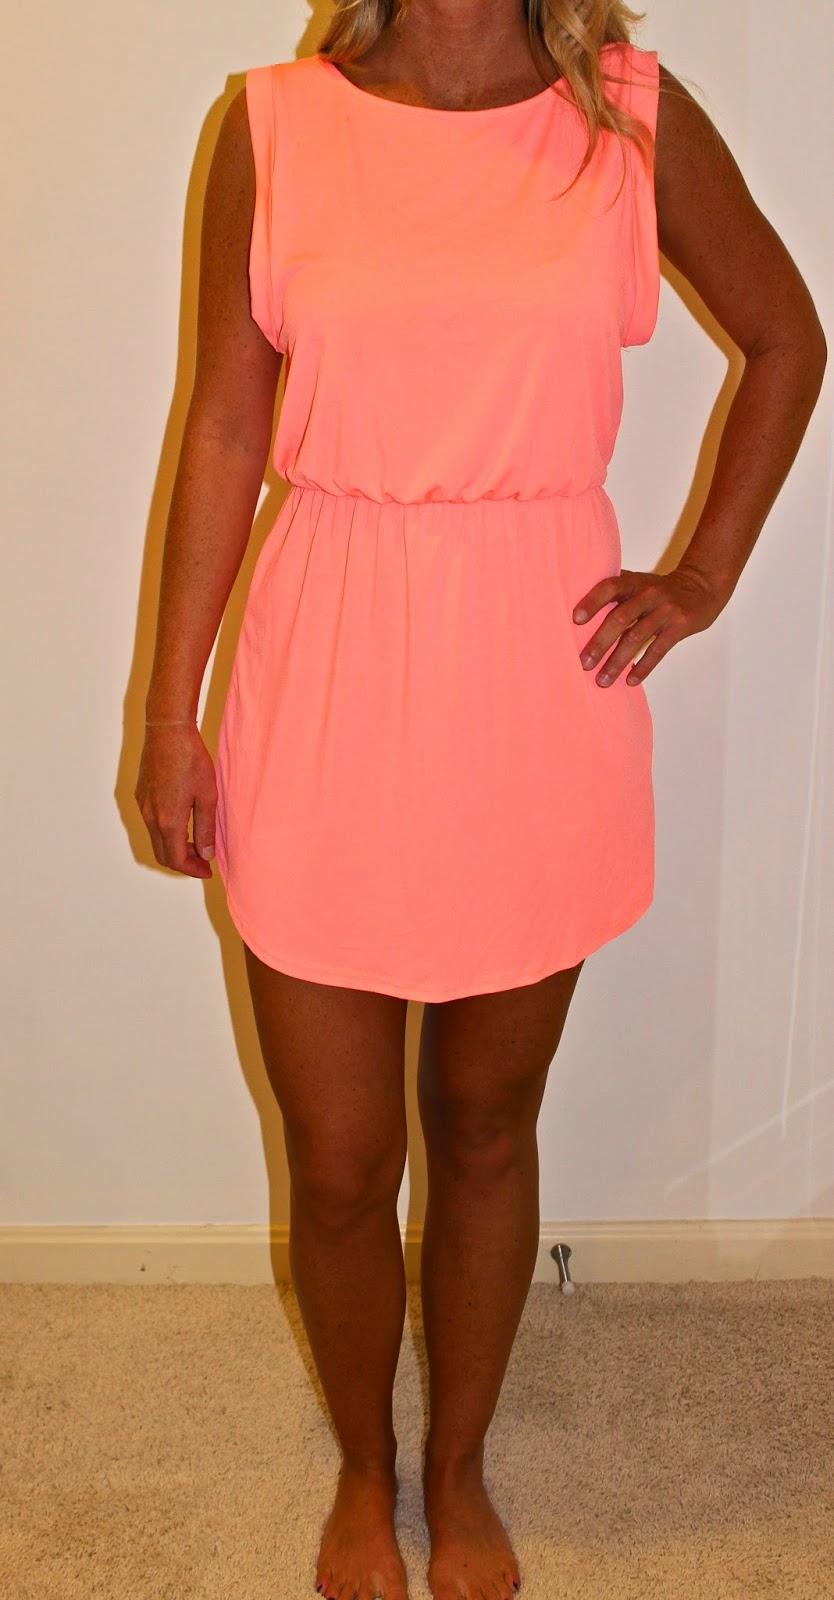 ebay coral dress